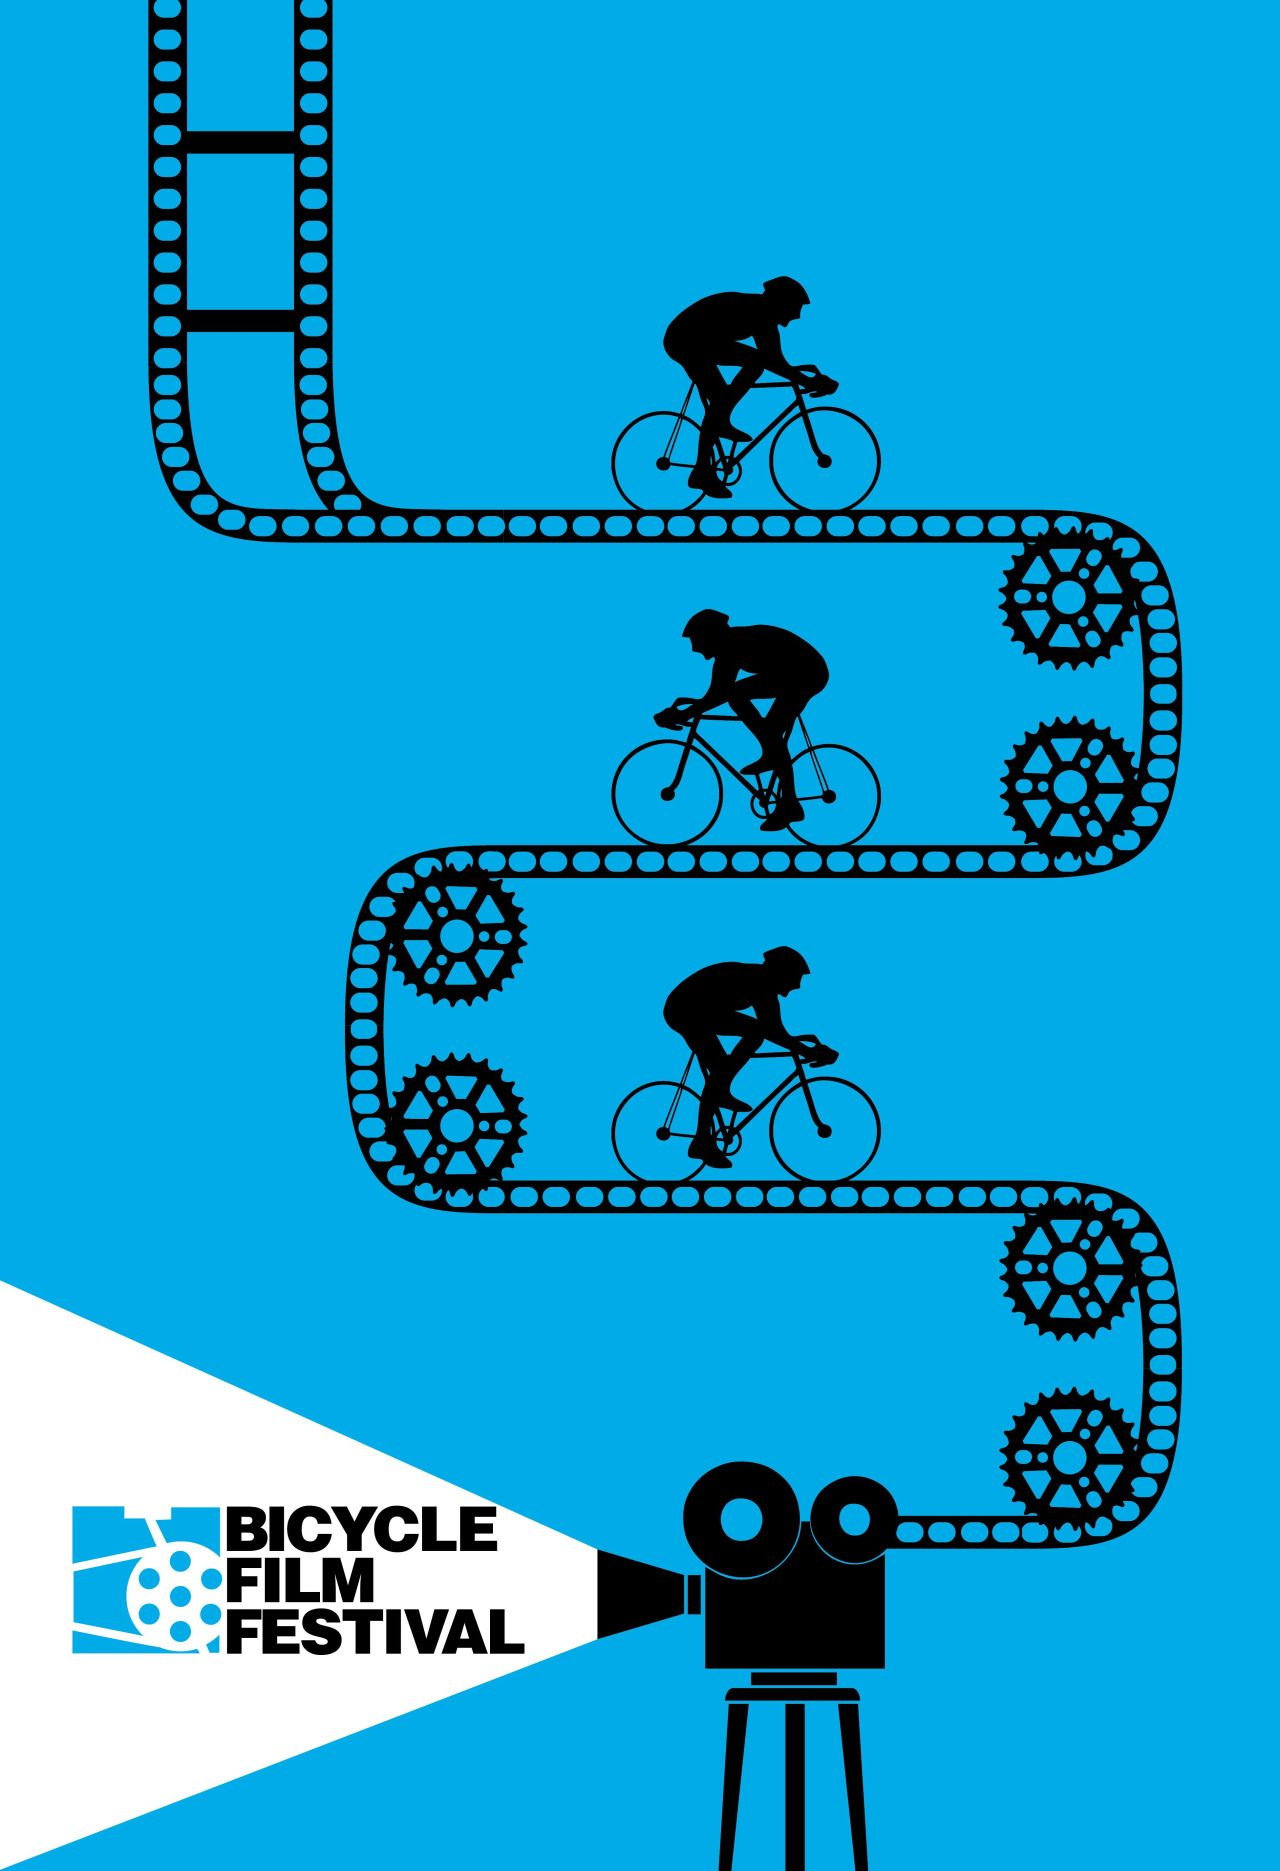 juergvollmer: Velo Illustration 031: Bicycle Film Festival ...